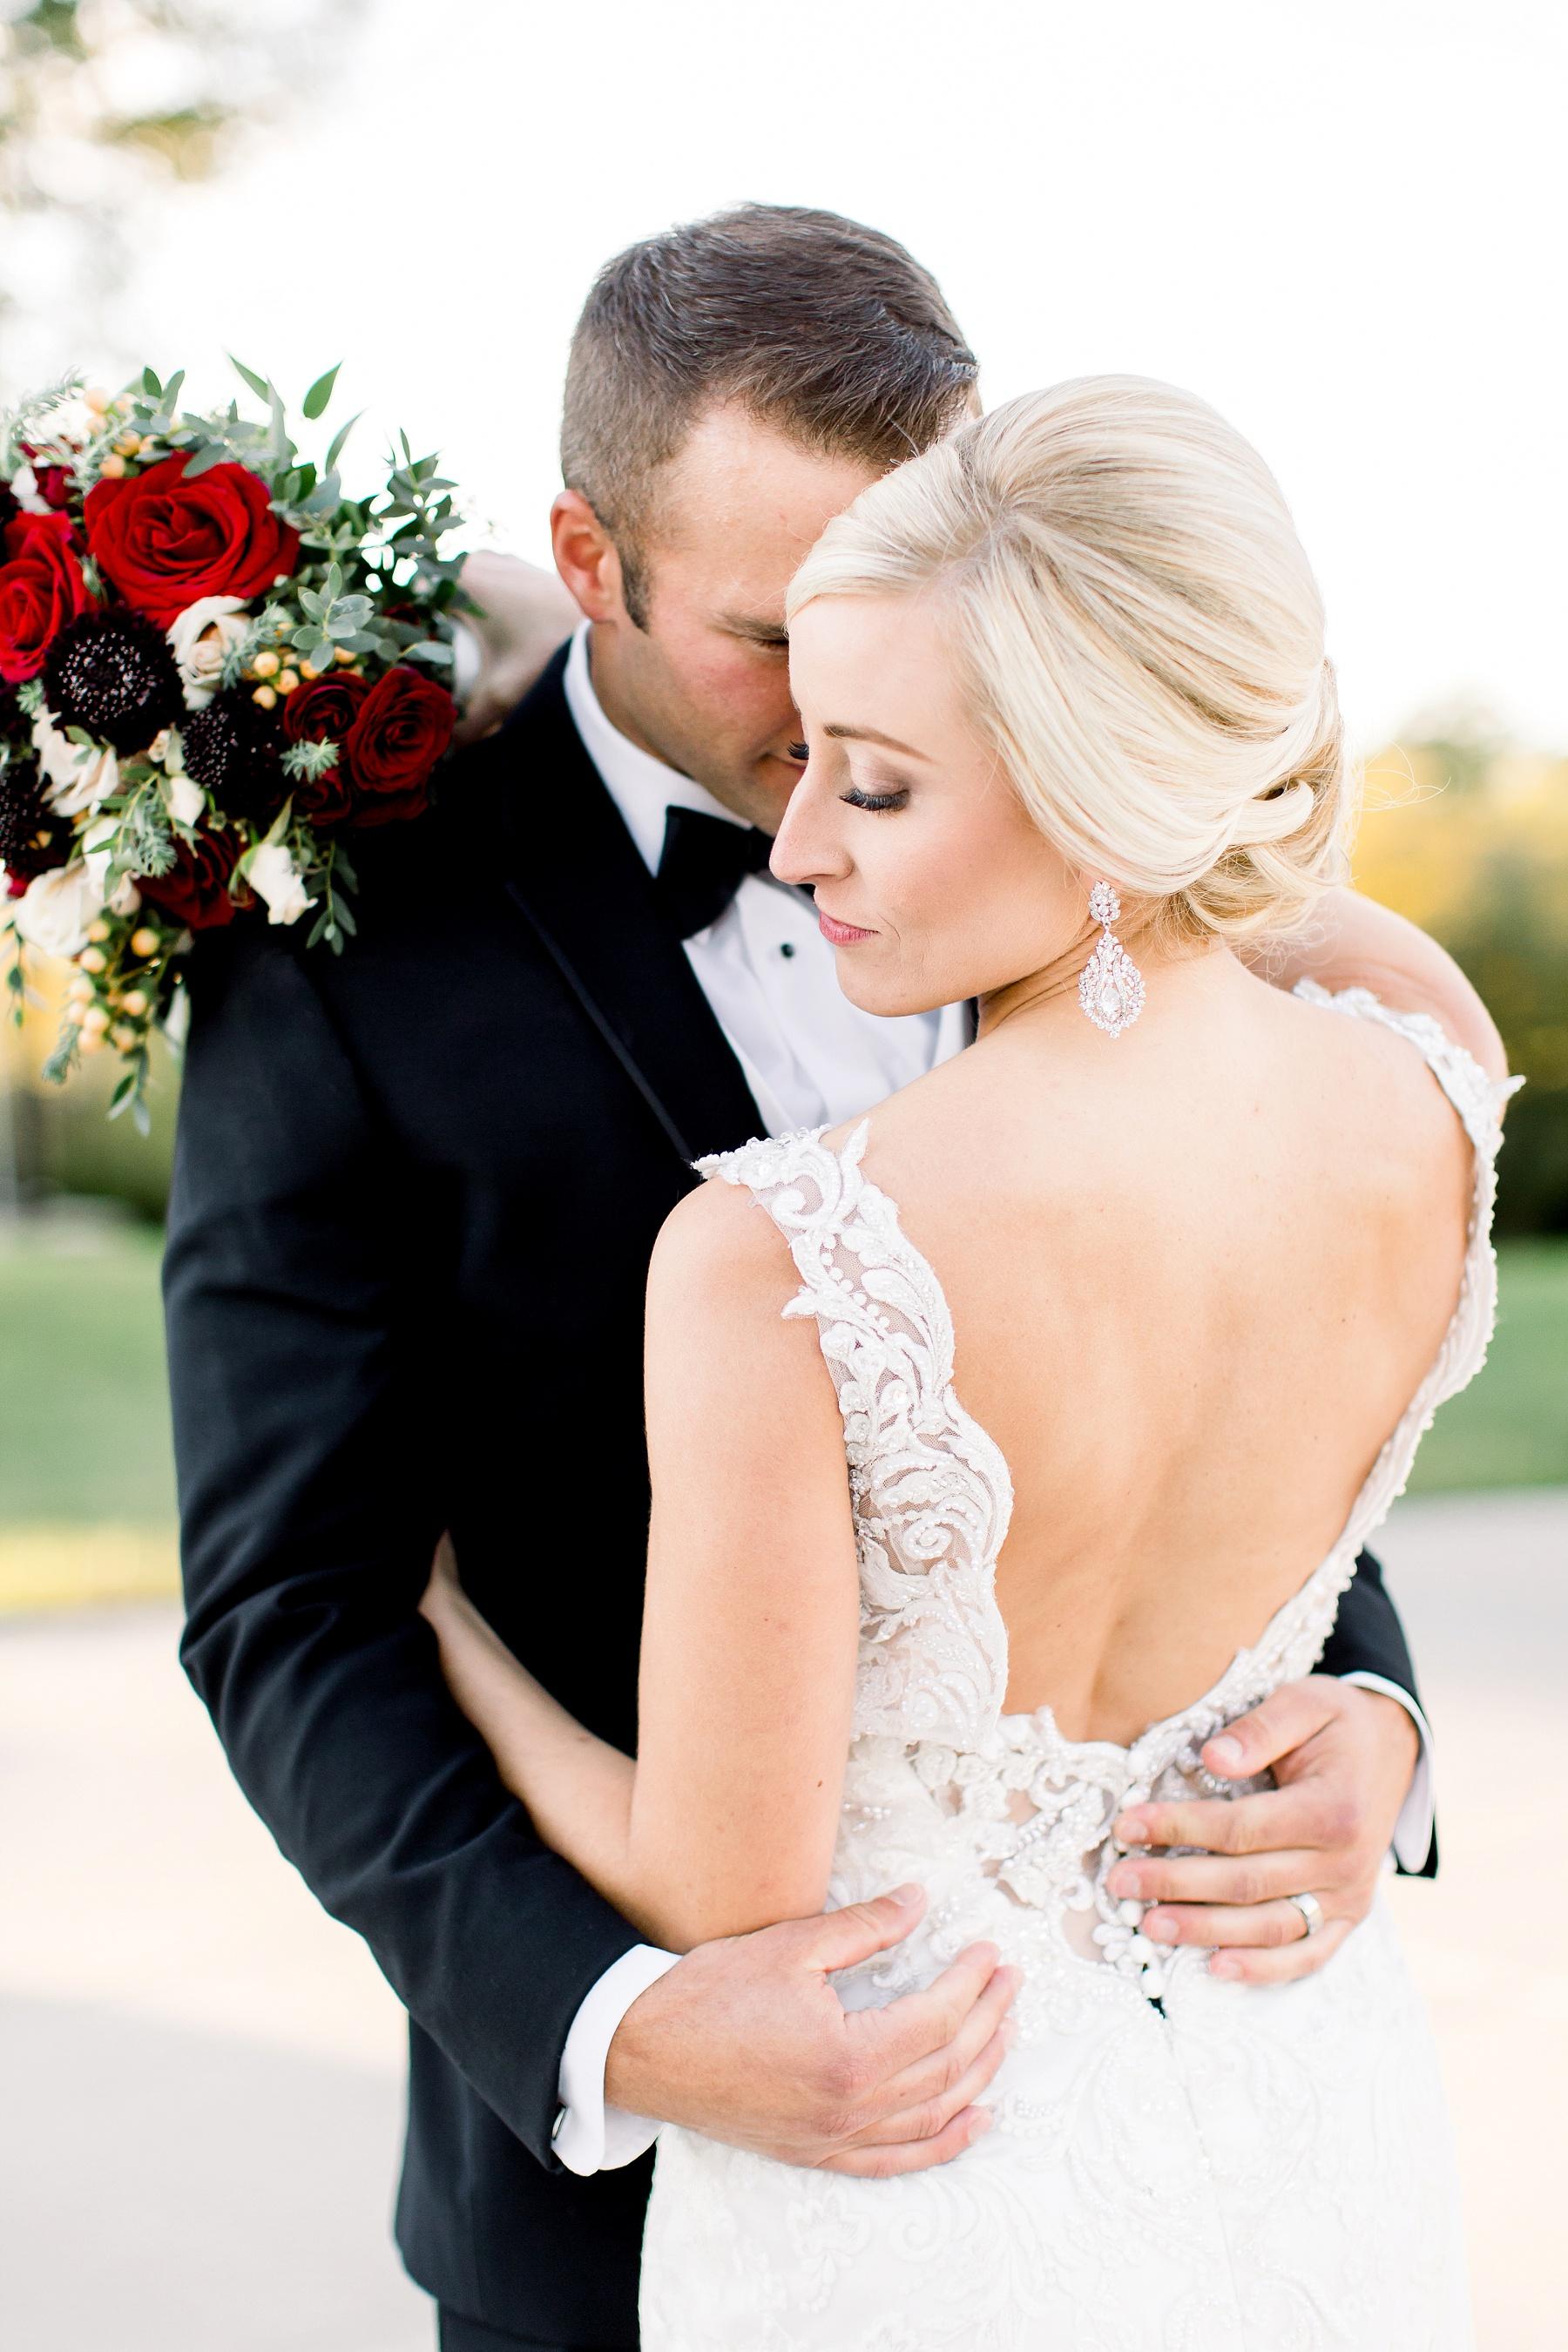 midwest-adventurous-wedding-photographer-elizabeth-ladean-photography-photo_4813.jpg